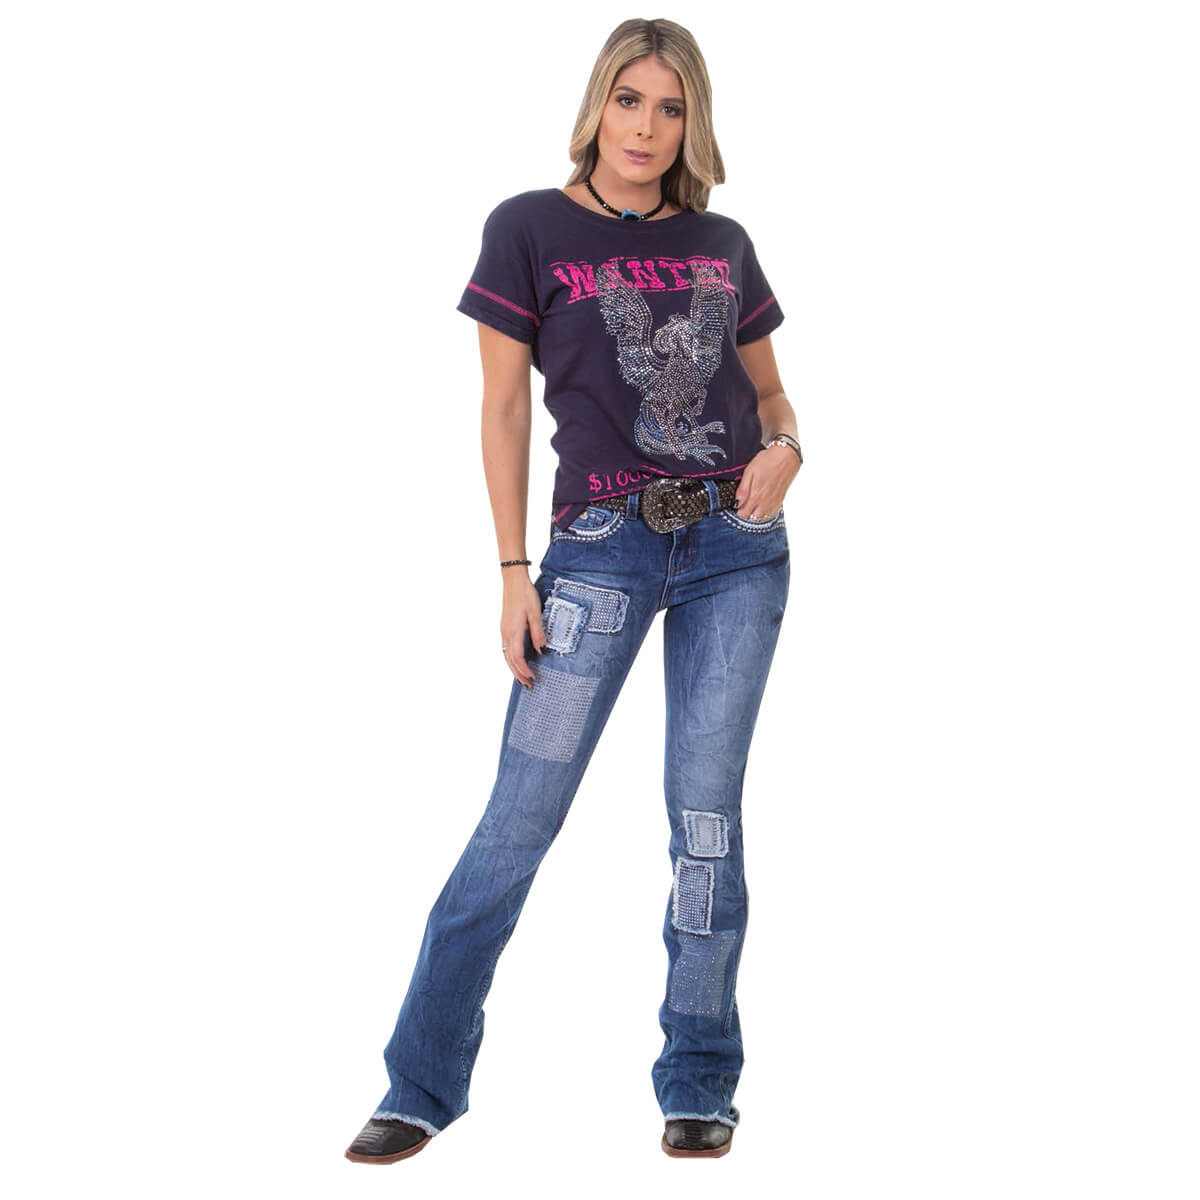 T-Shirt Zenz Western Reward